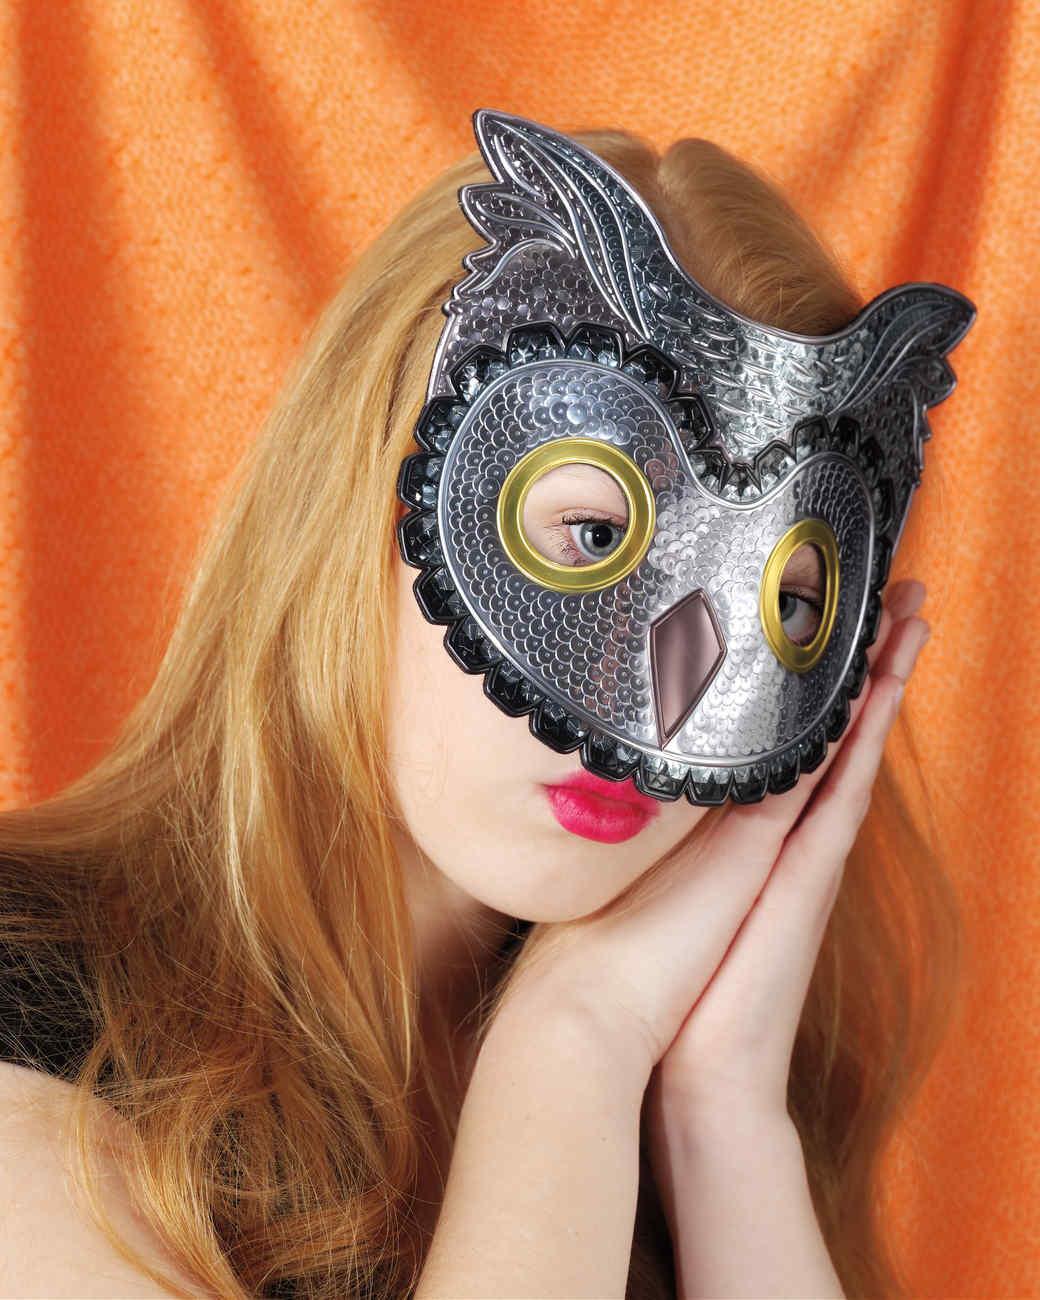 mscrafts-hlwn-mask3.jpg